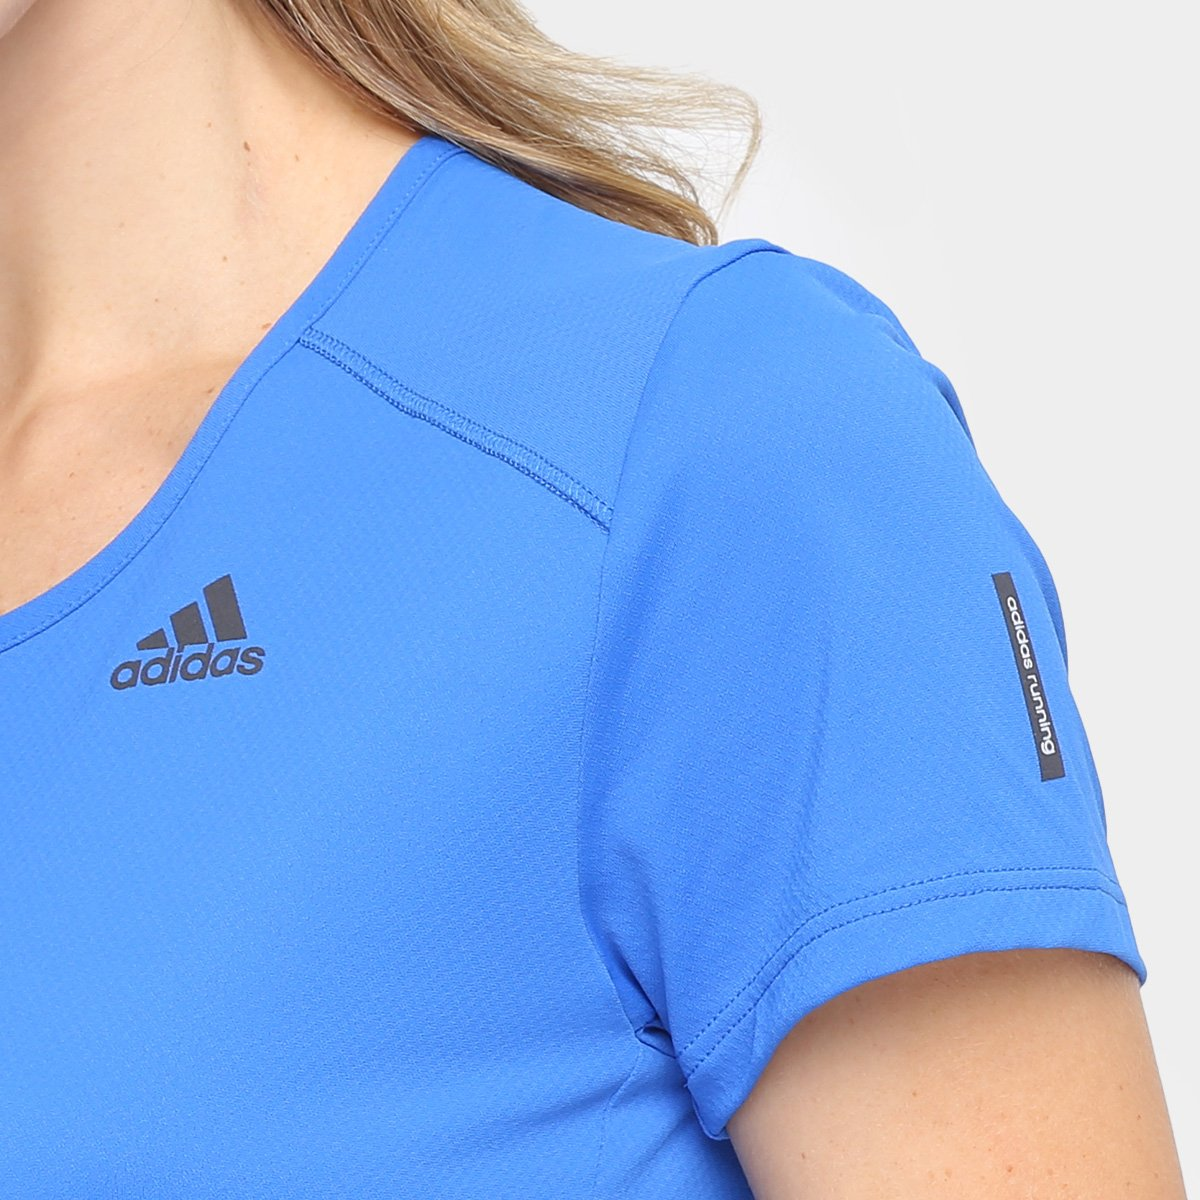 Response Camiseta Feminina Feminina Response Adidas Poliamida Adidas Poliamida Azul Azul Camiseta ZXqEwZTxd